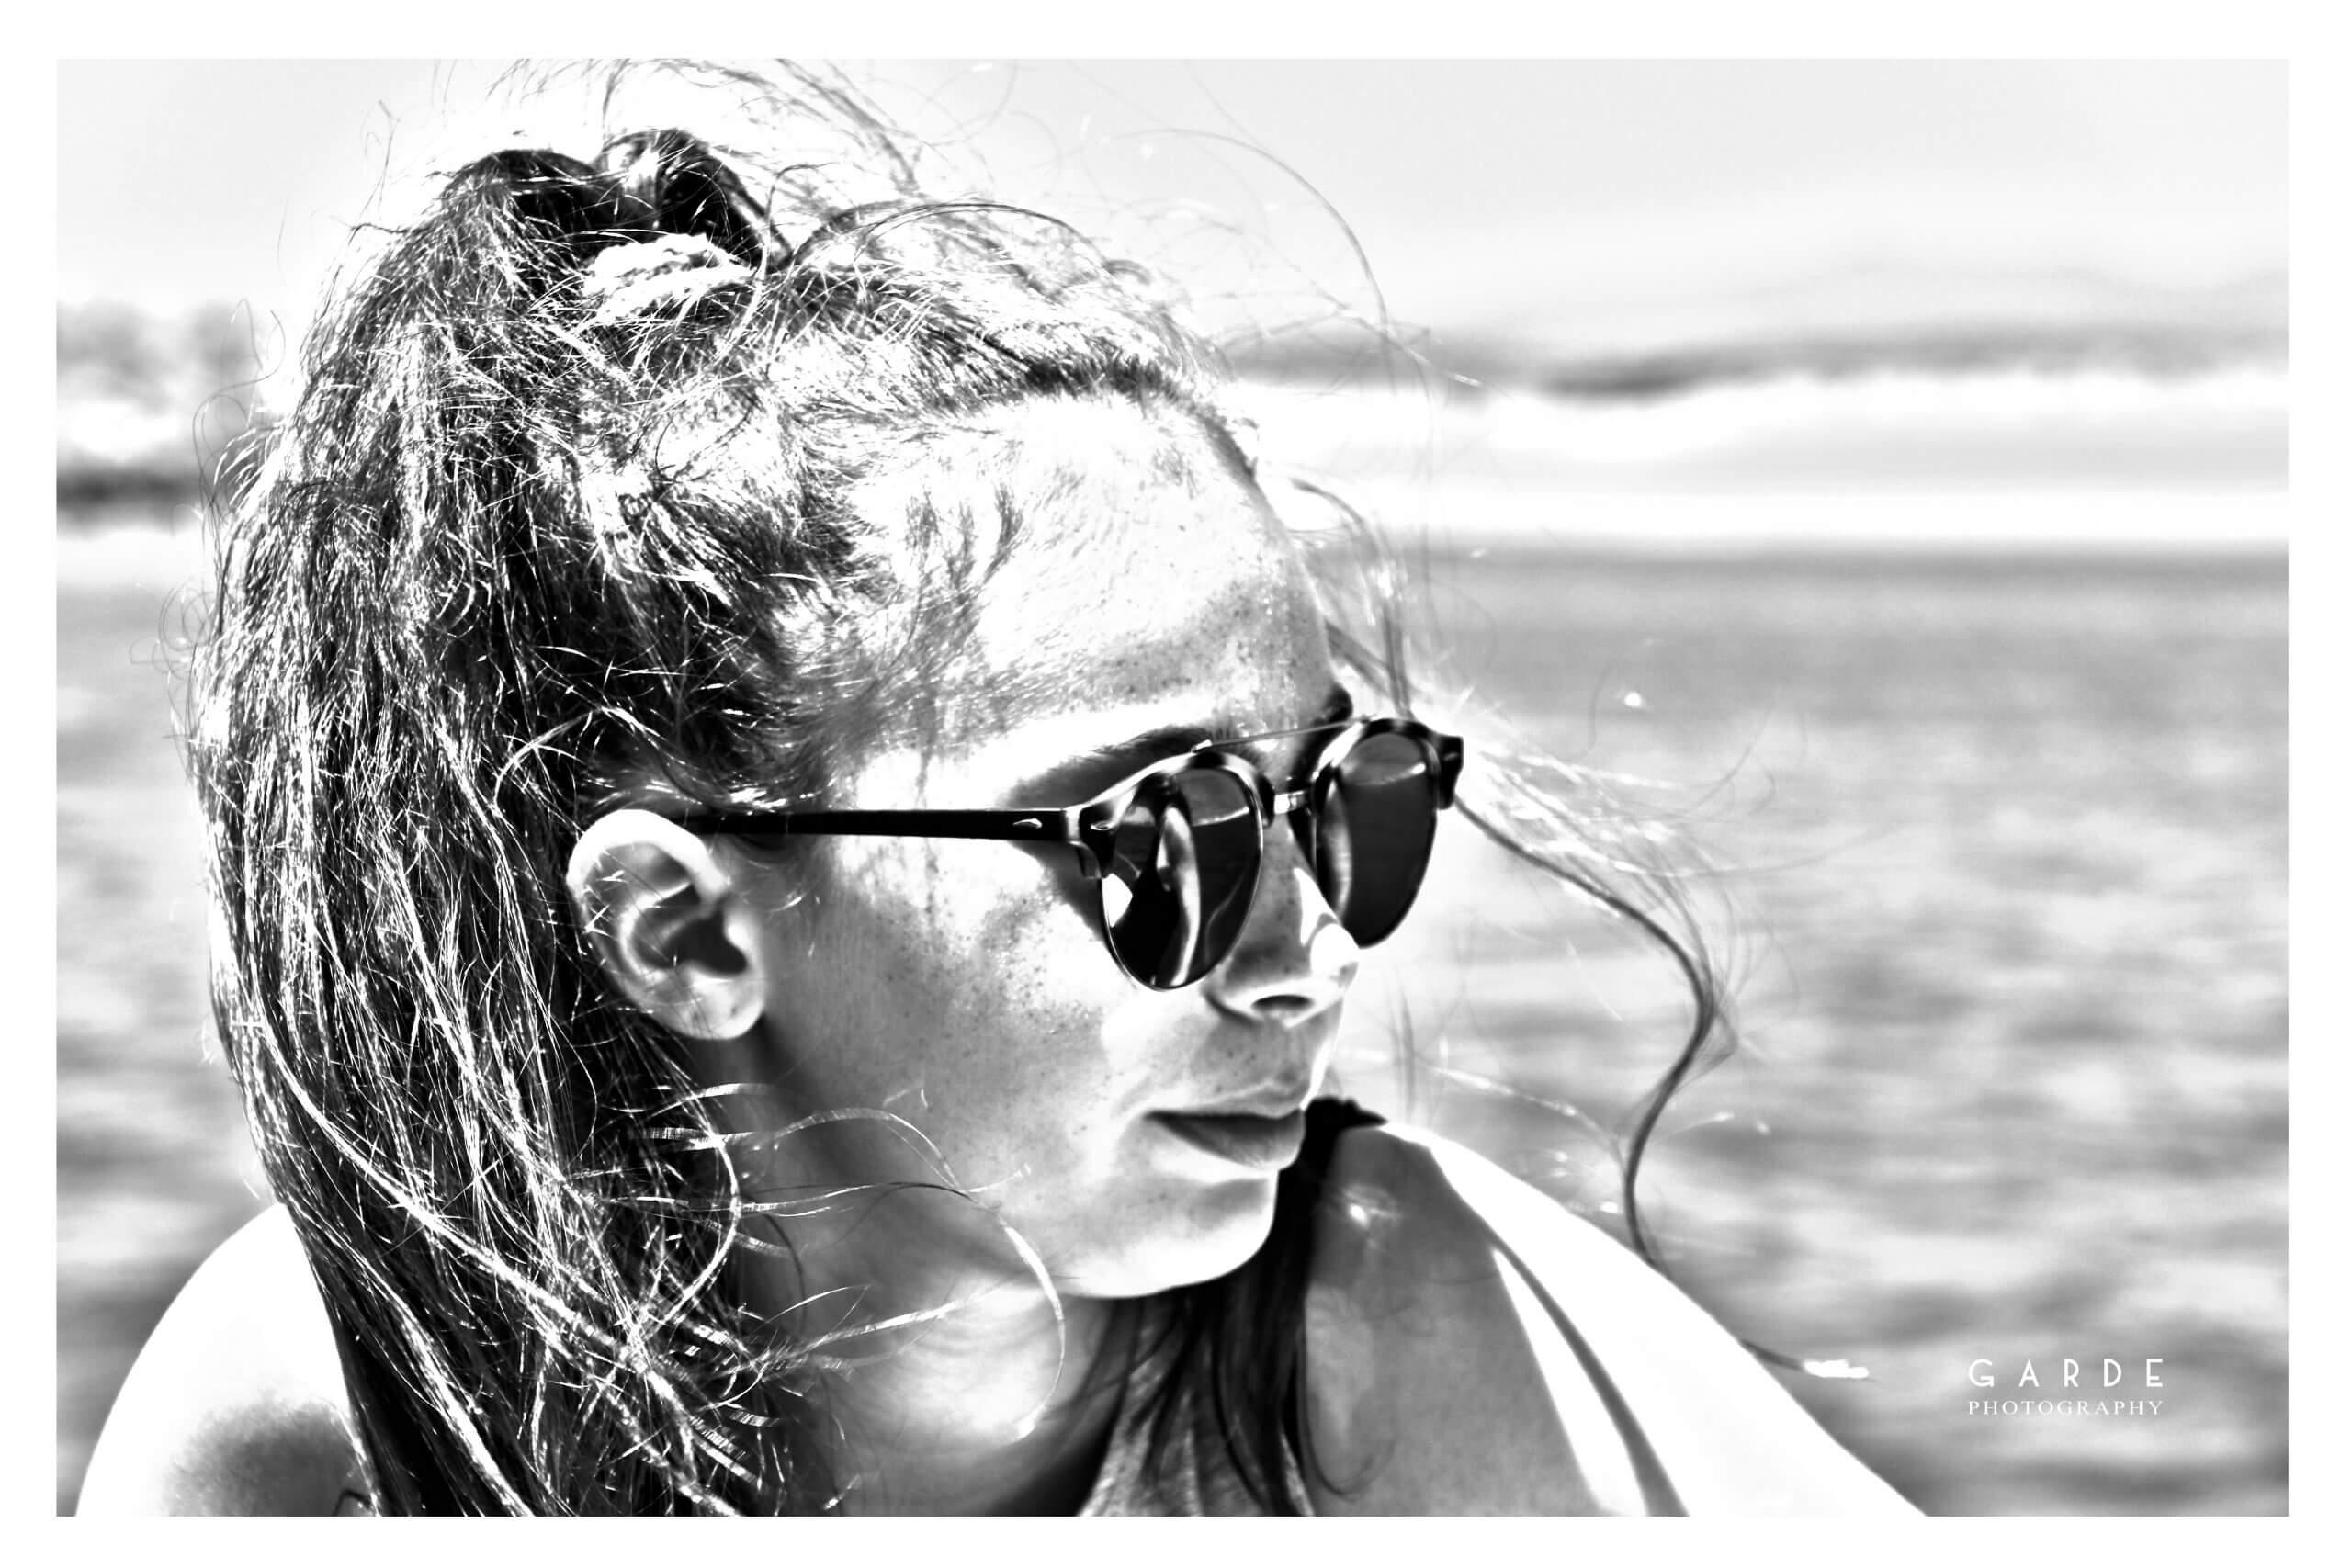 Alvor_Boat_Anna_IMG_2921_Monochrome